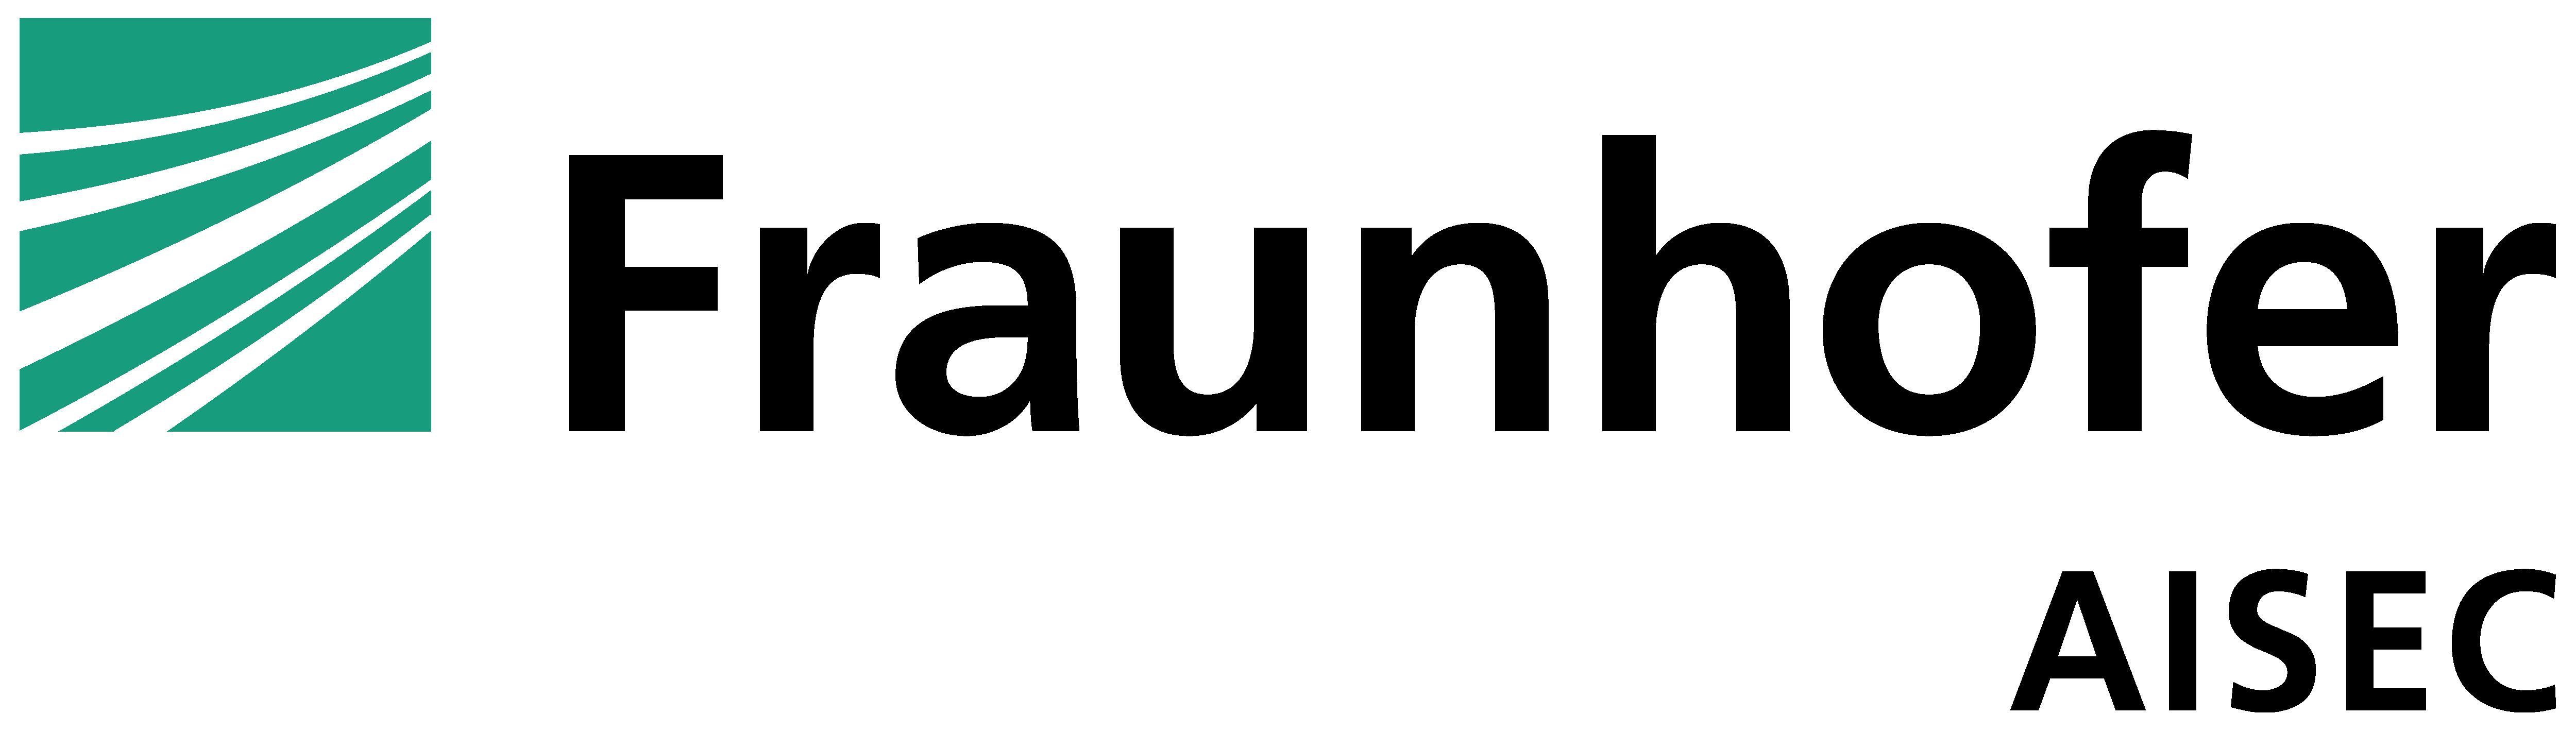 Fraunhofer AISEC